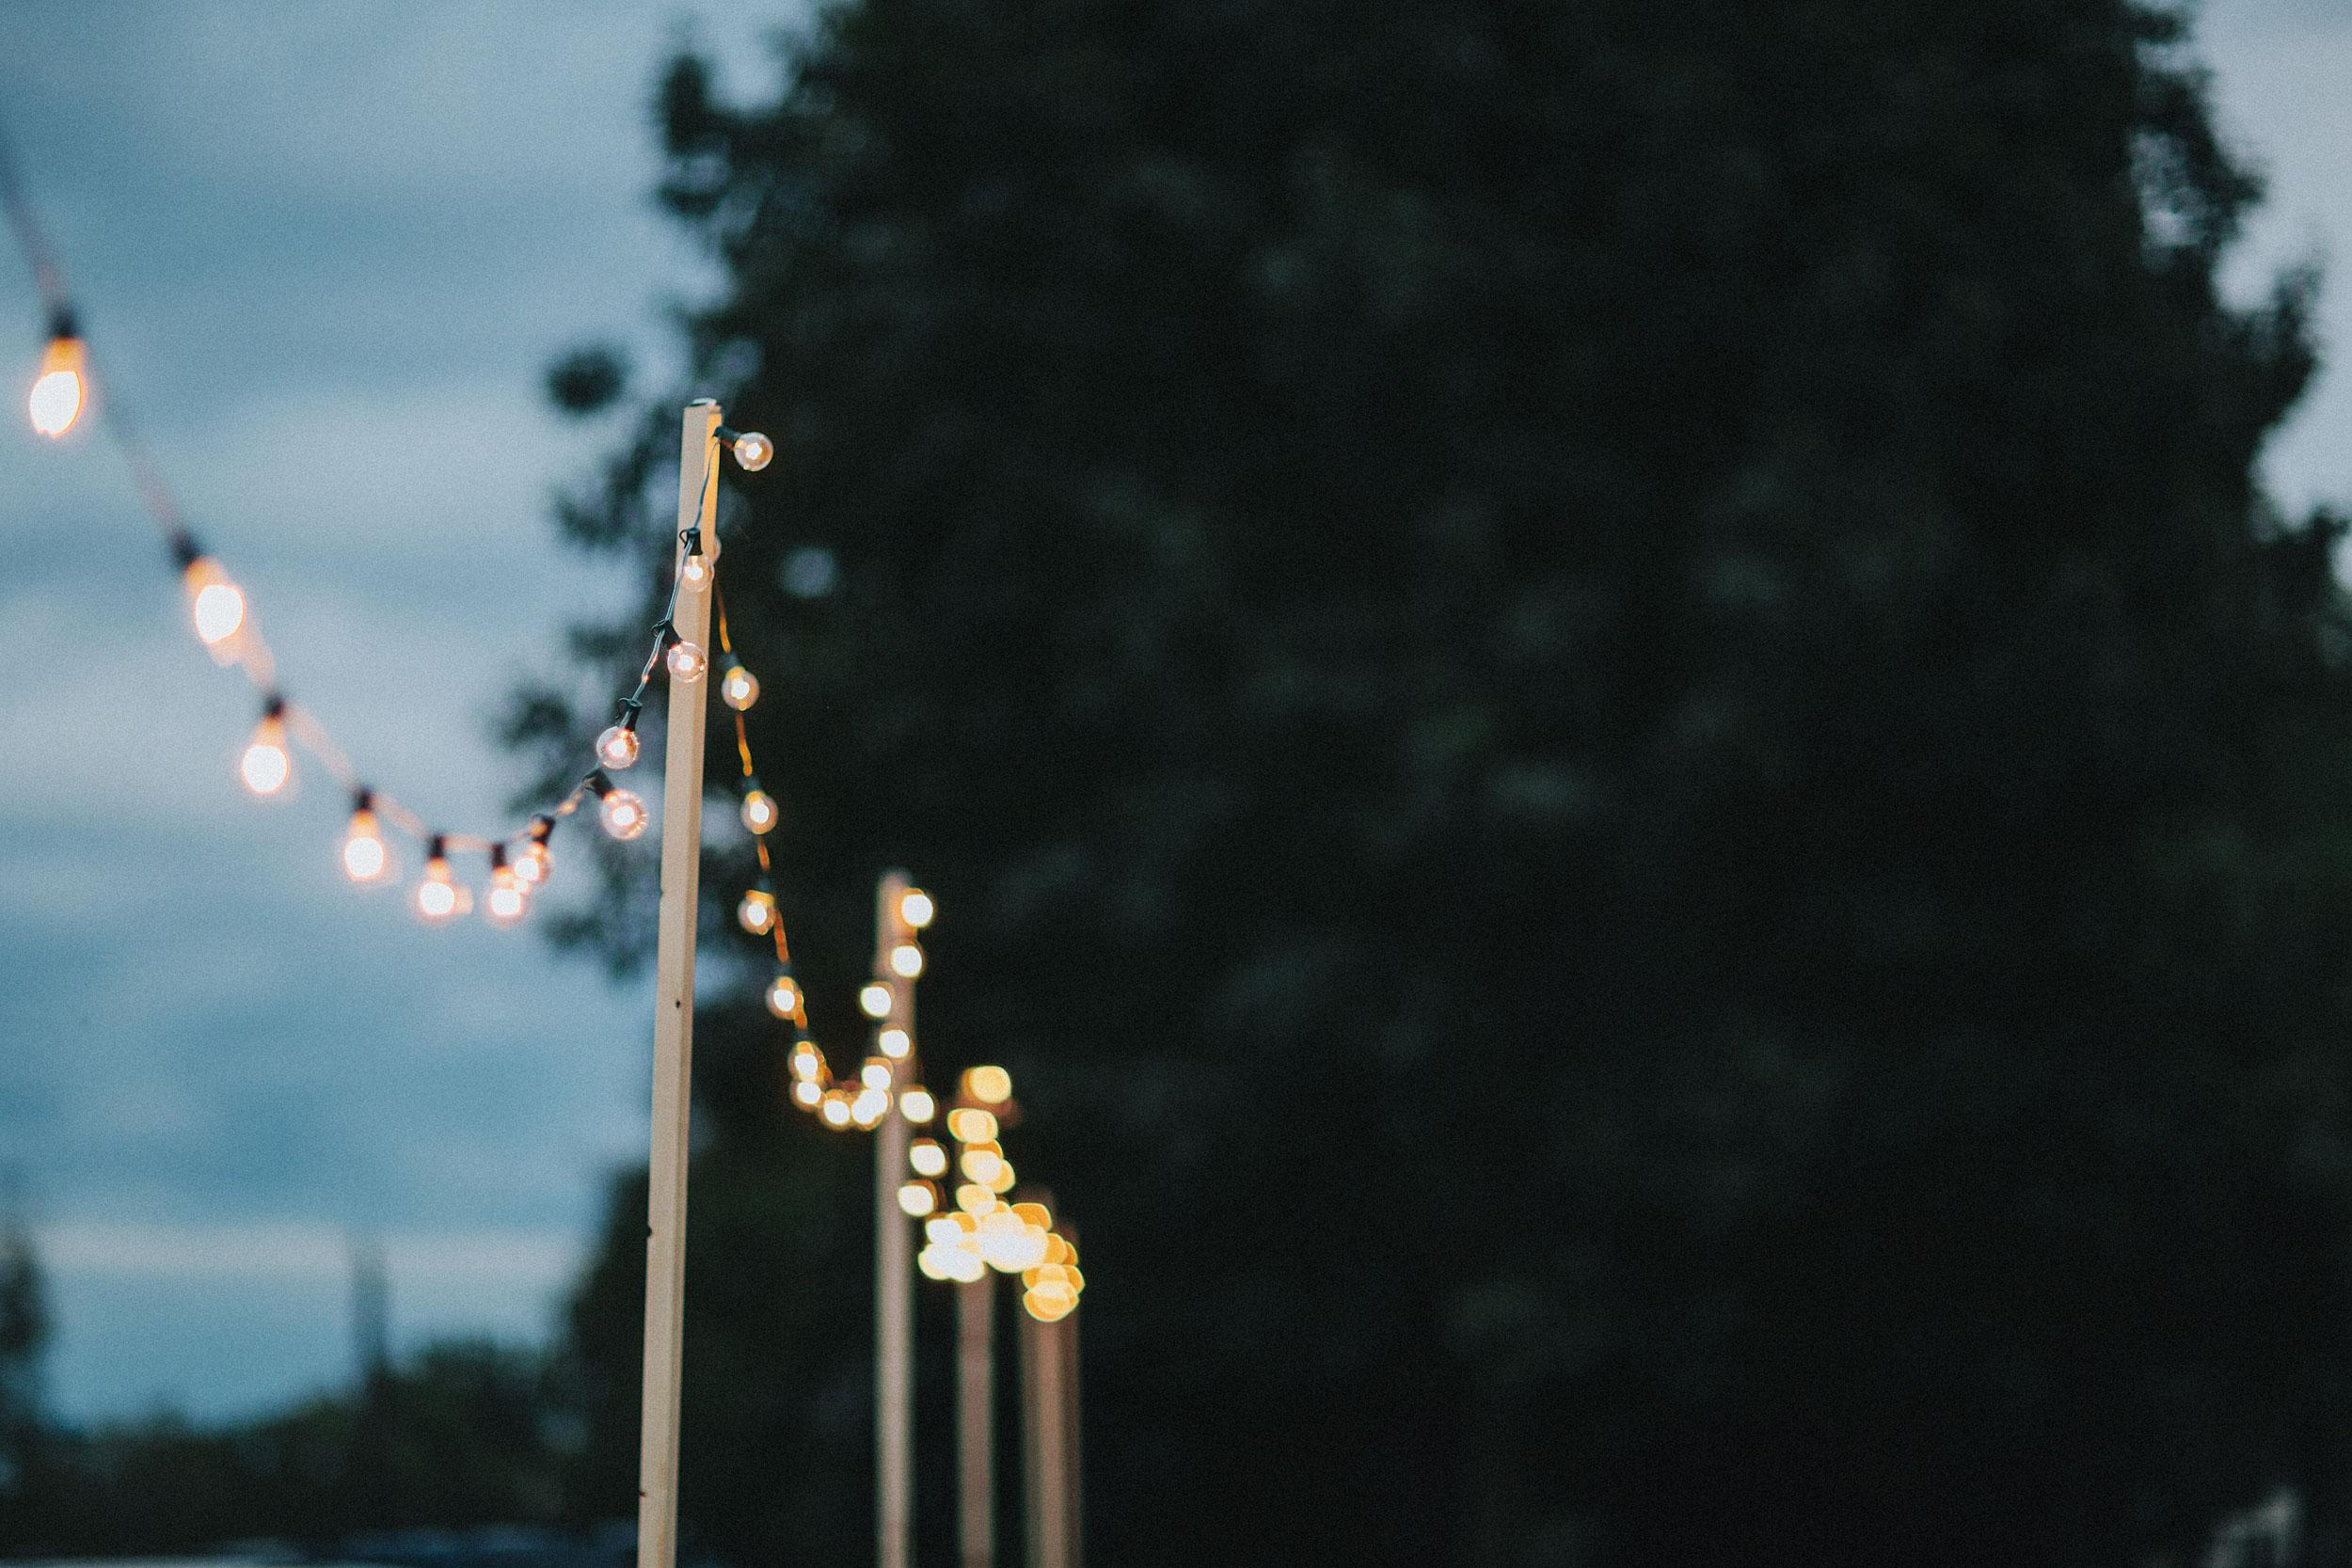 saxony-farm-wedding-photographer-25.JPG